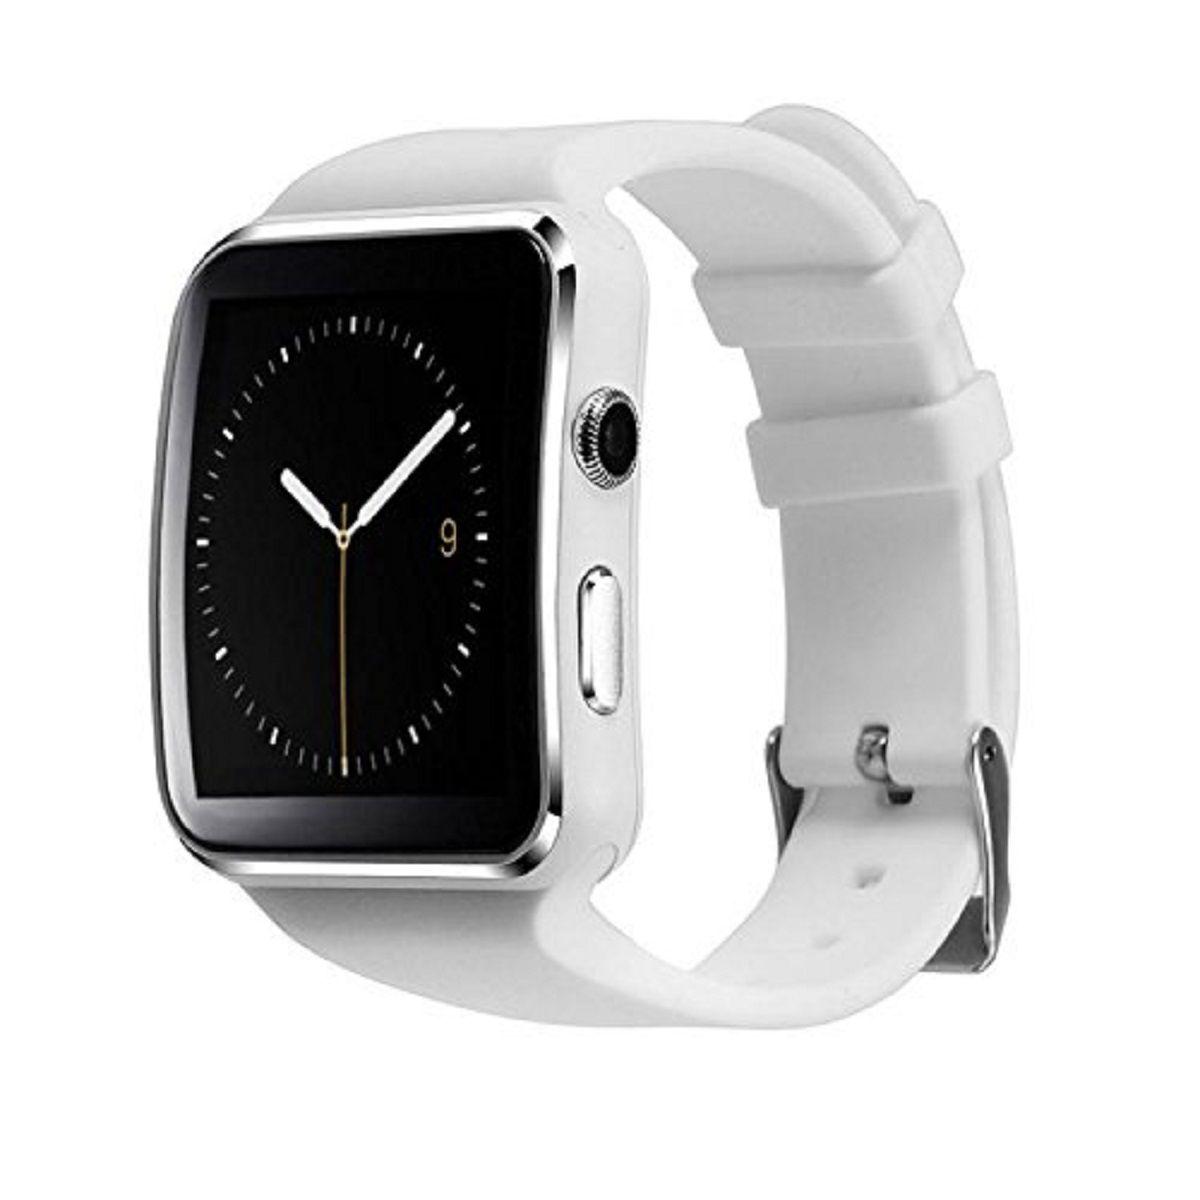 AVIKA Vivo X3S      Compatible Smart Watches